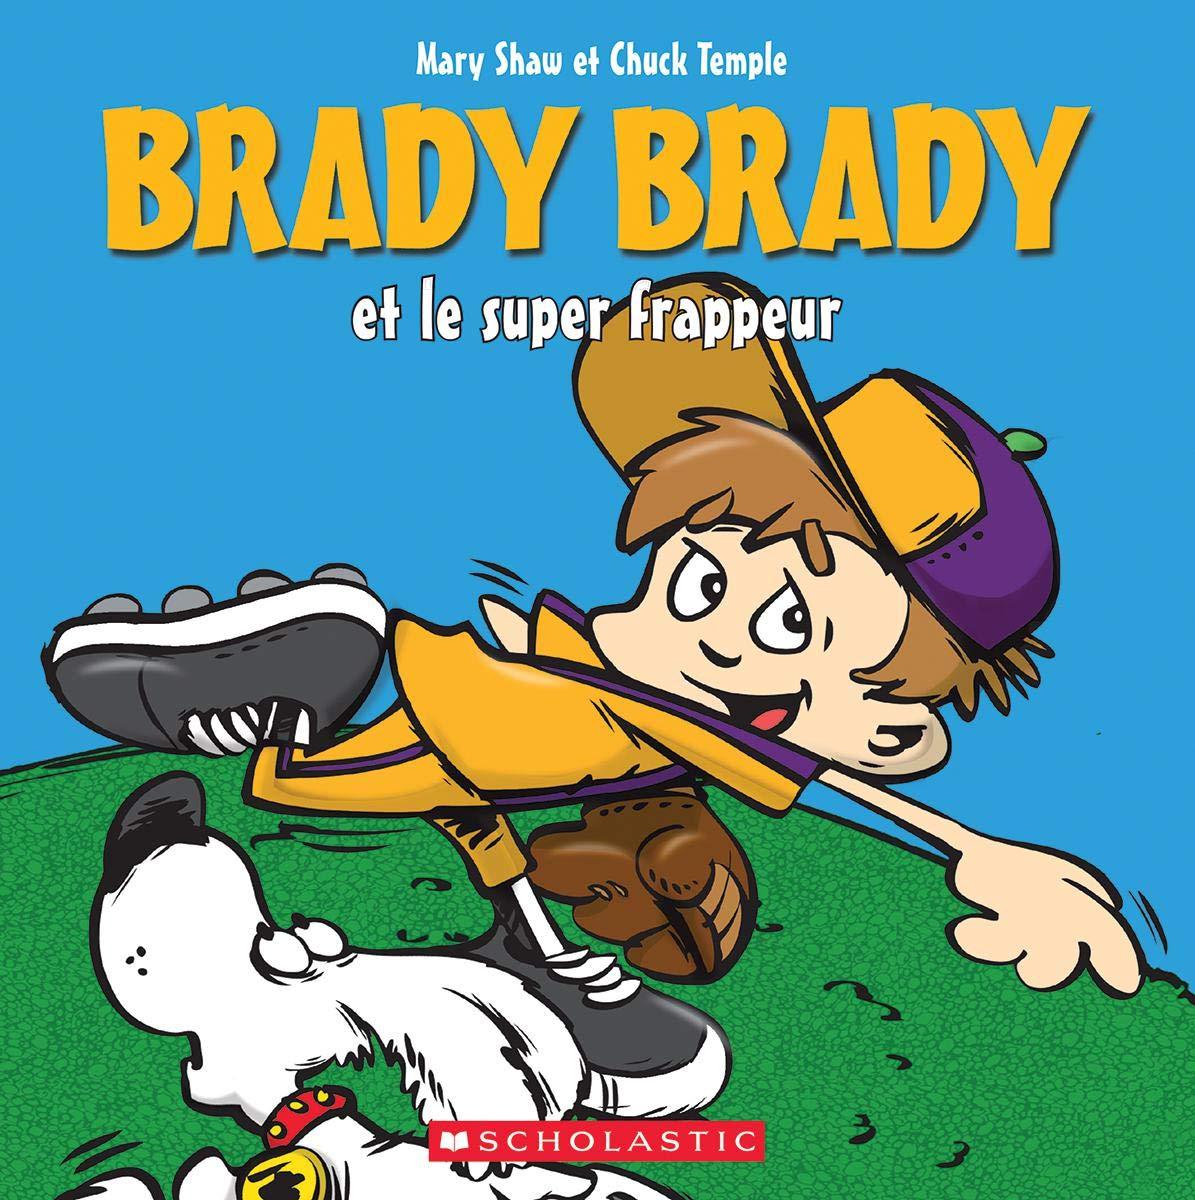 Brady Brady: Brady Brady et le super frappeur